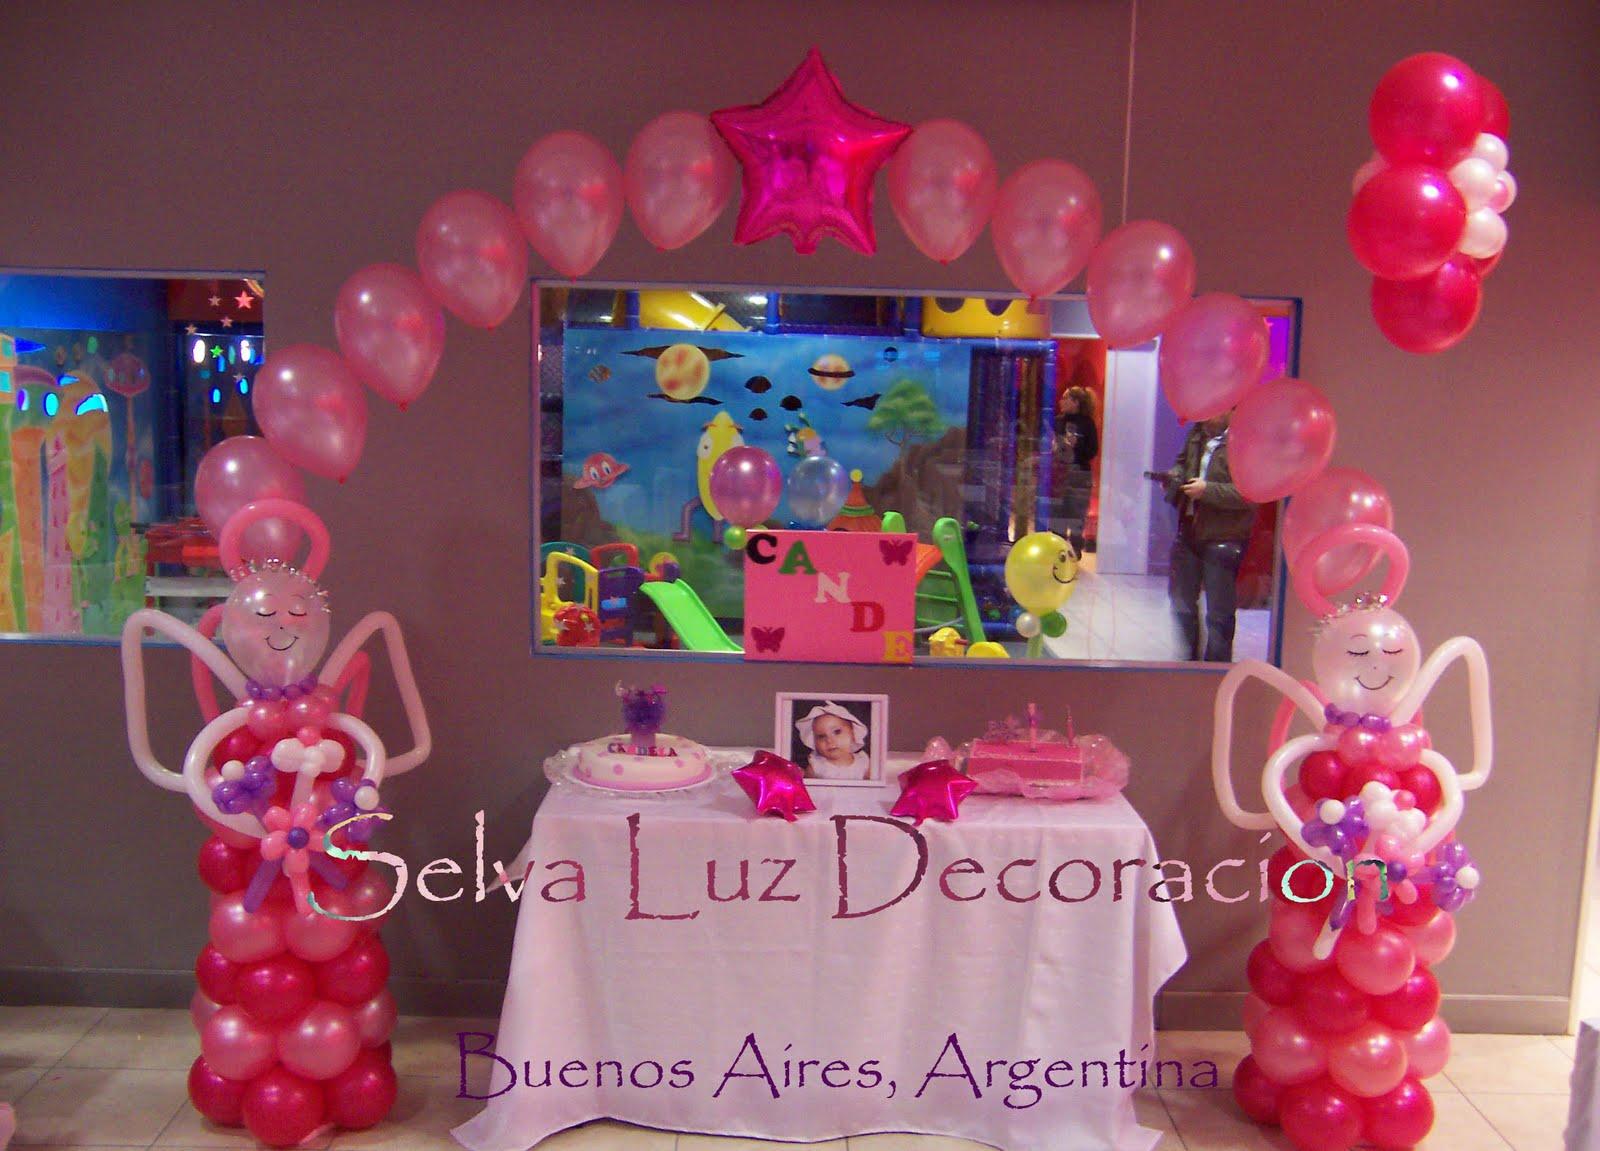 Selva Luz decoración con globos.Buenos Aires Argentina.